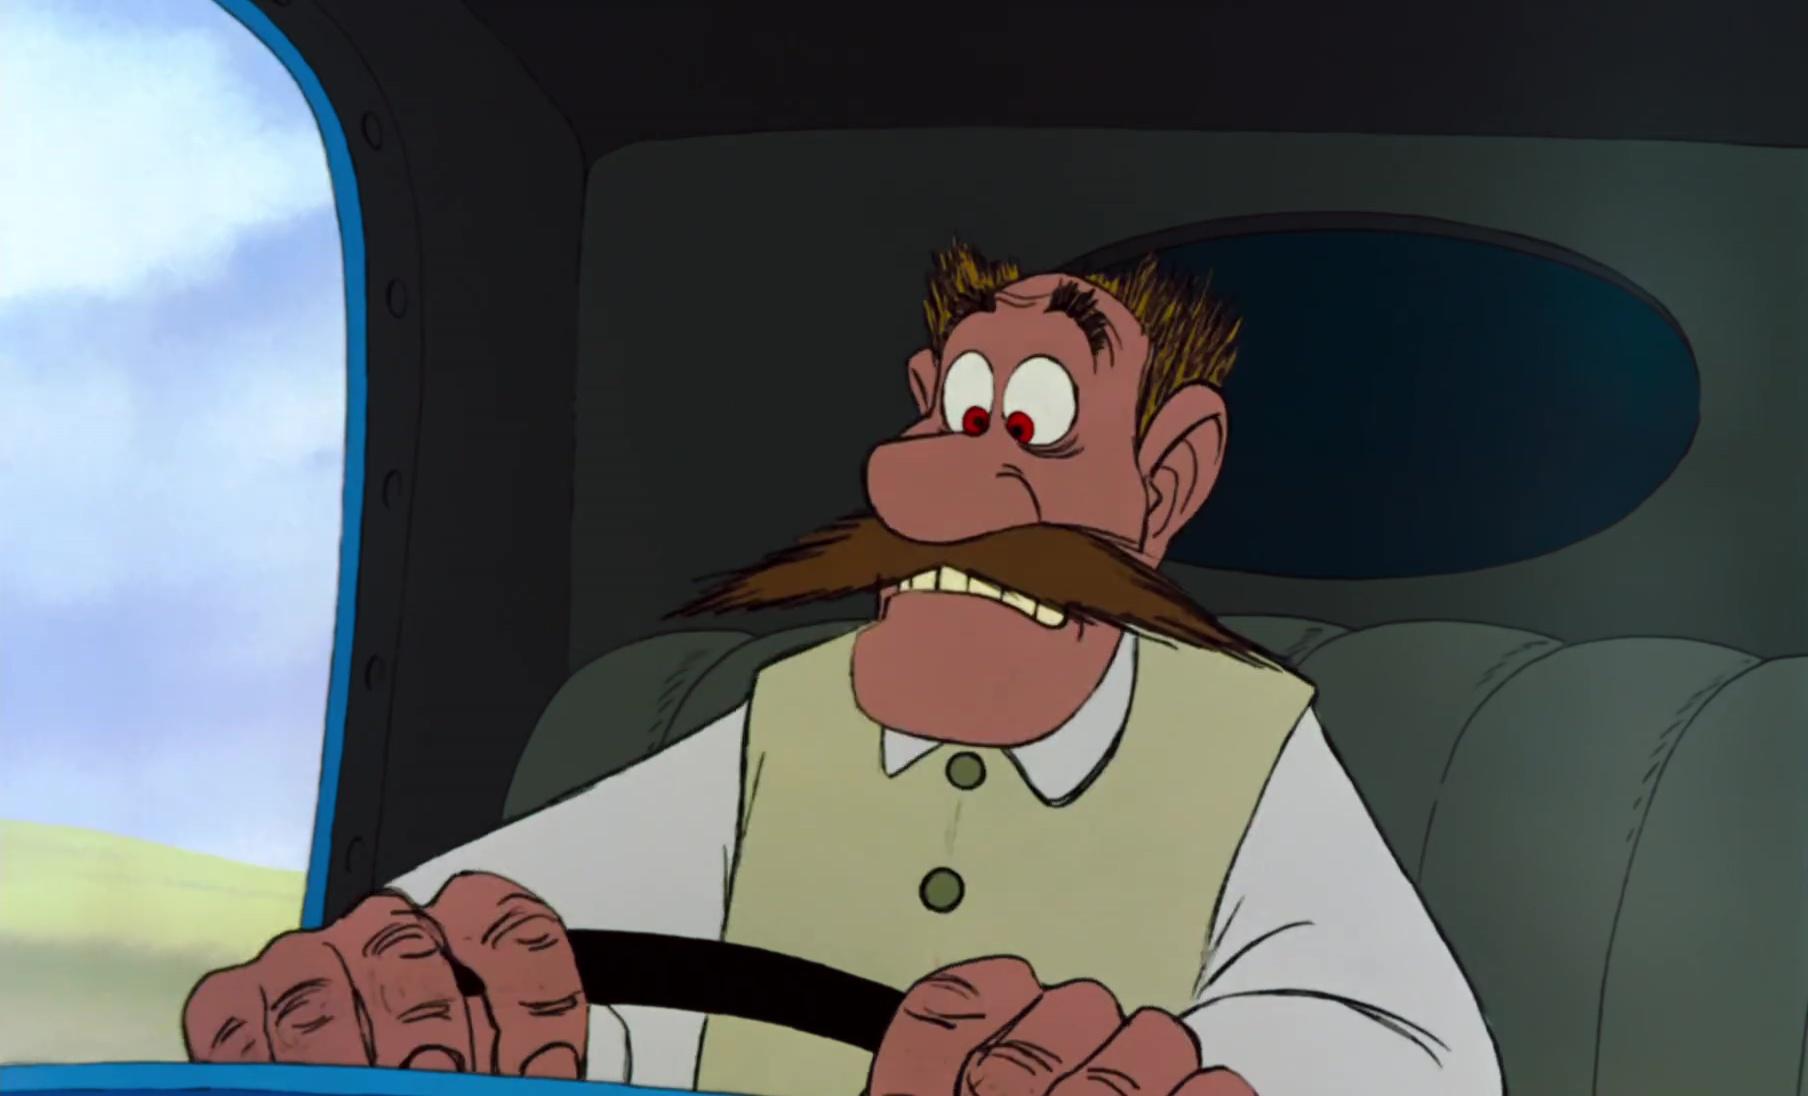 laitier milkman personnage character aristochats aristocats disney animation